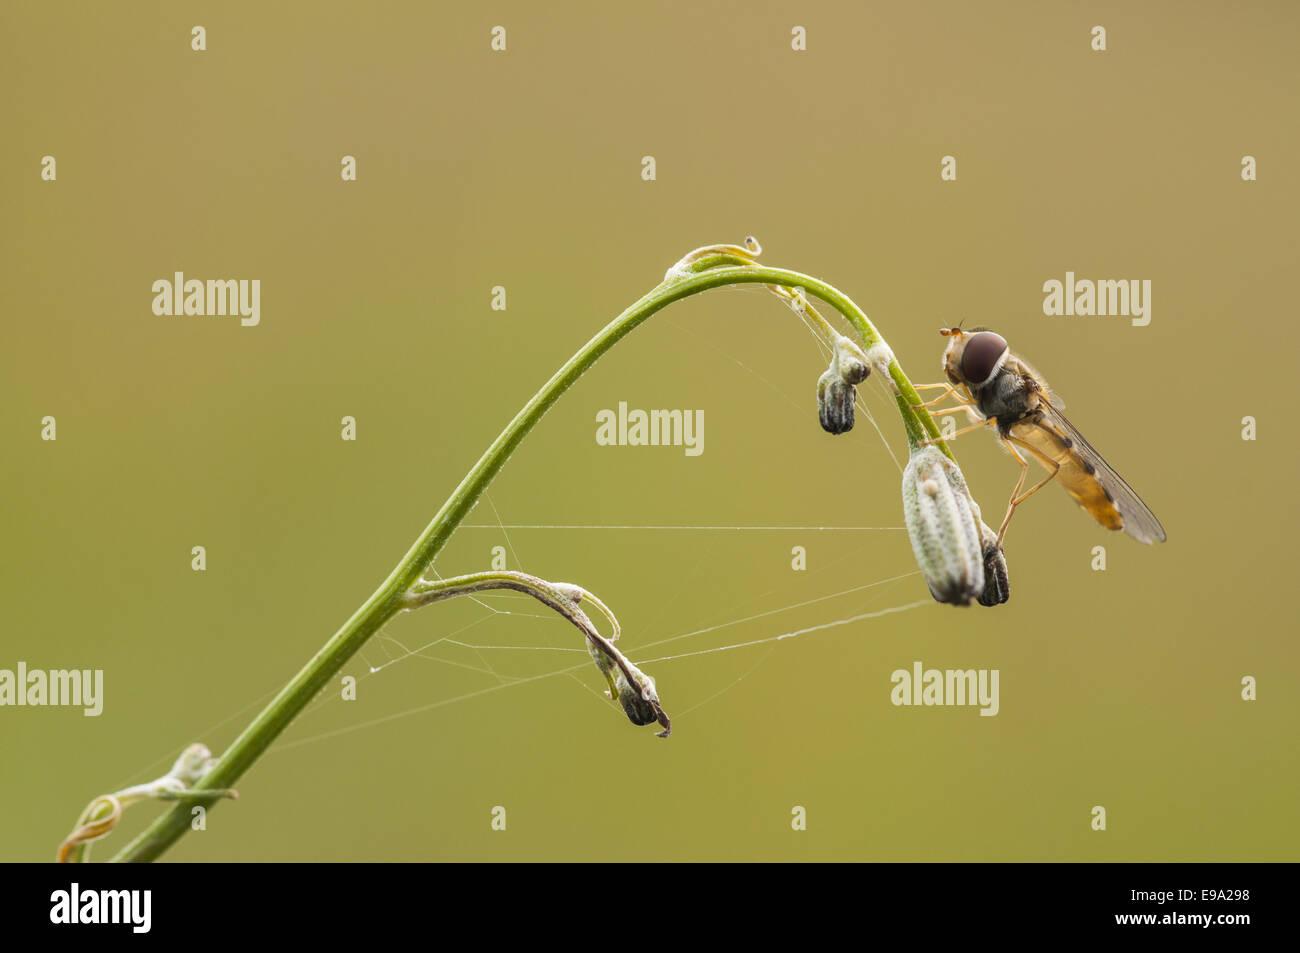 Hoverfly (Syrphus ribesii), female, Germany - Stock Image